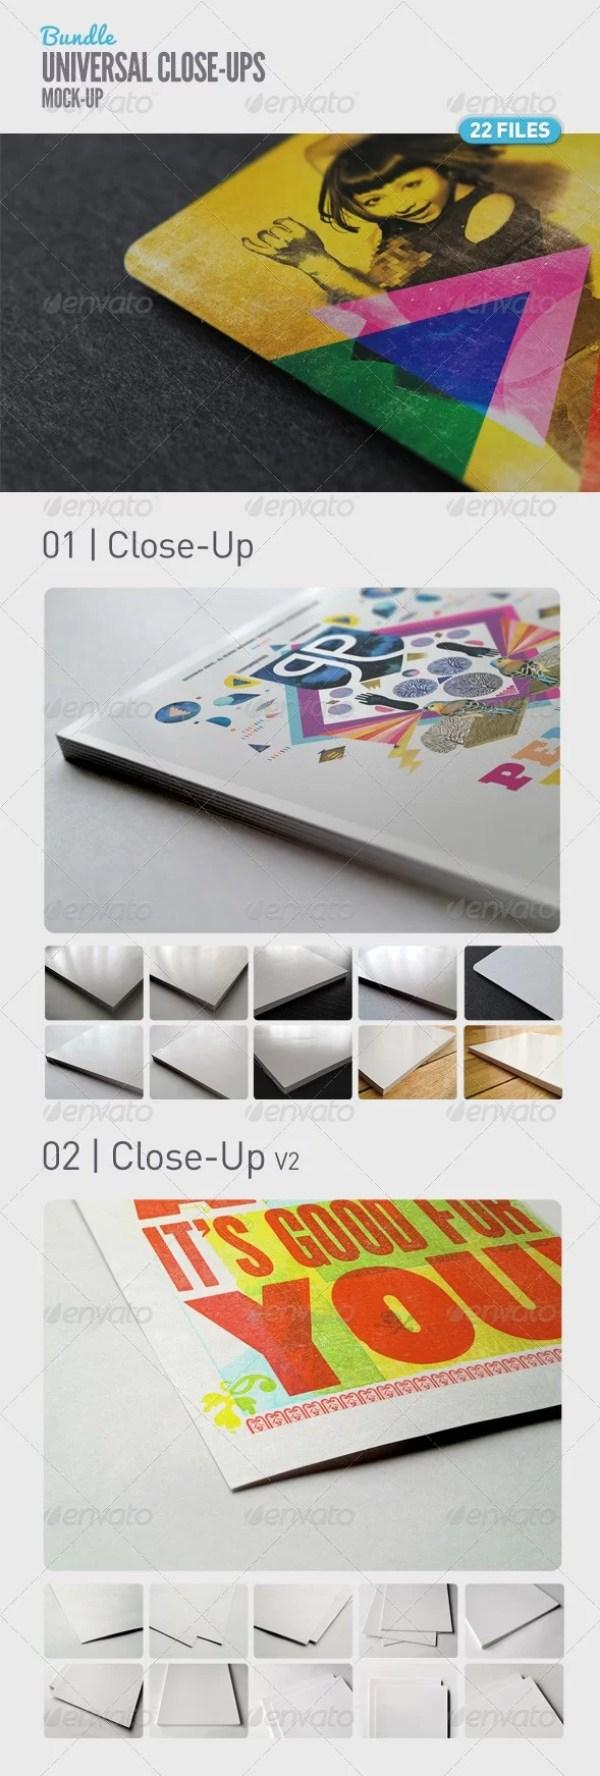 Universal Closeup Mockup Bundle